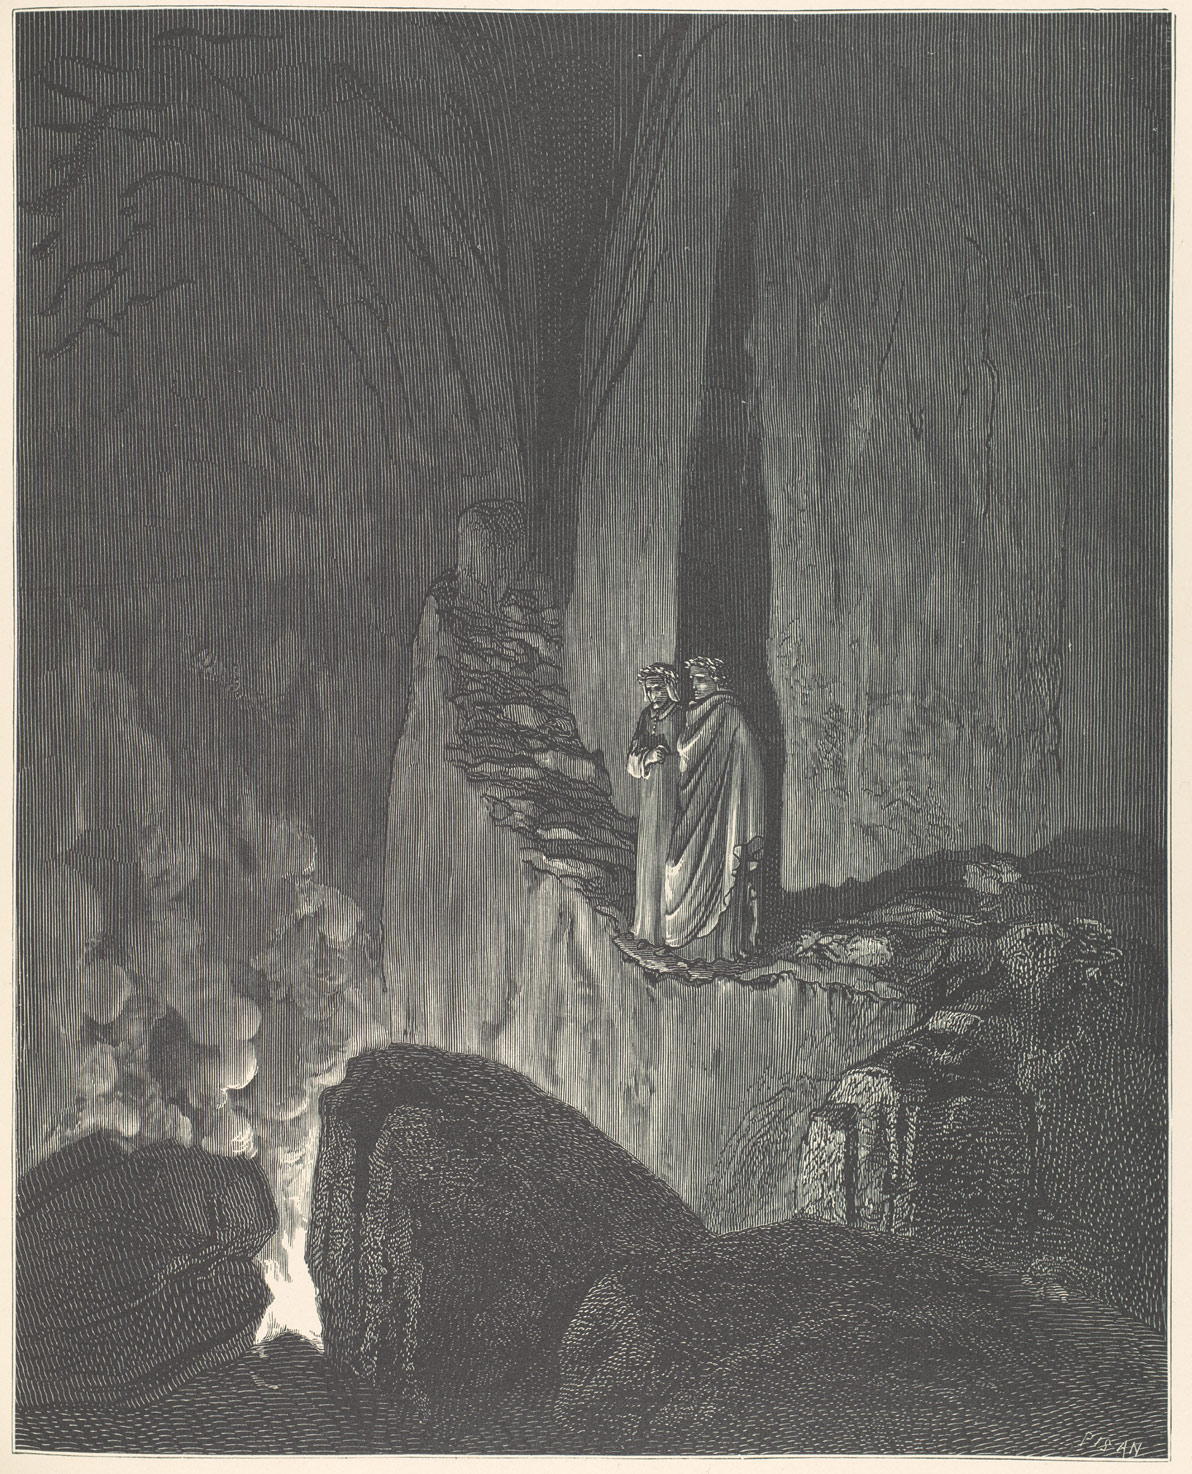 fig. 3   Gustave Doré, illustration for Canto XXVI, Dante's  Inferno  (1866).